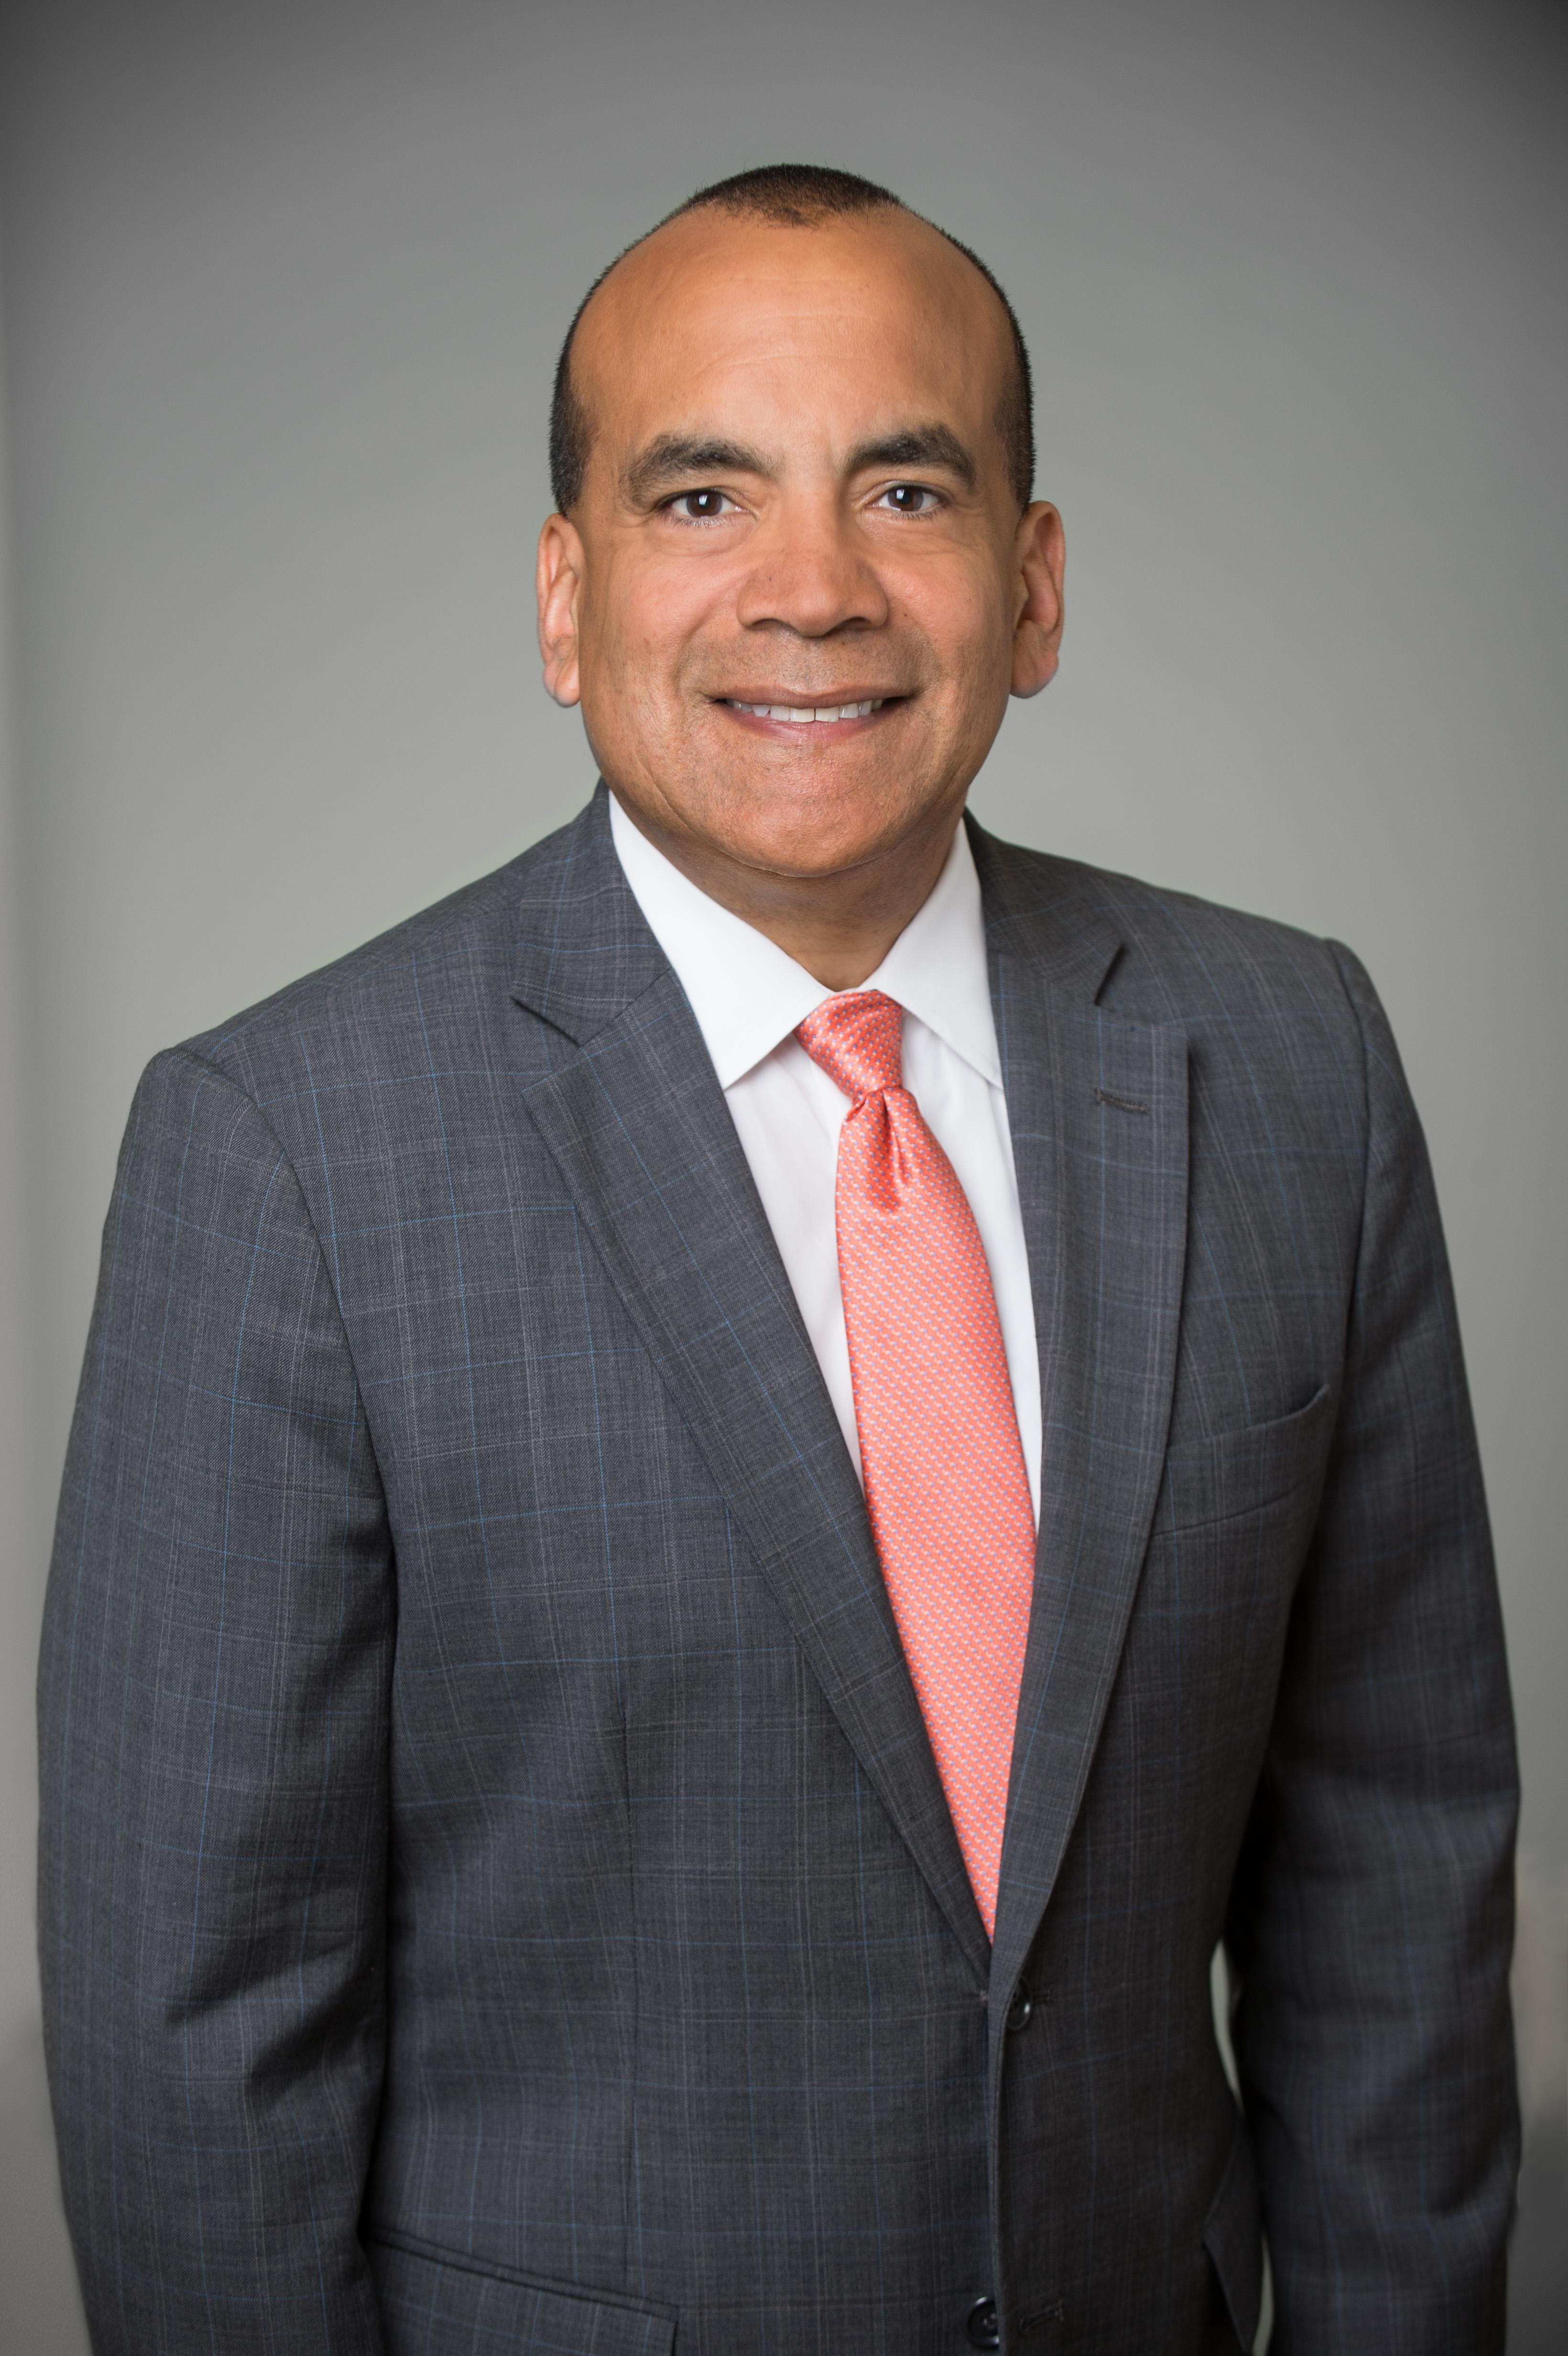 Julio A. Portalatin